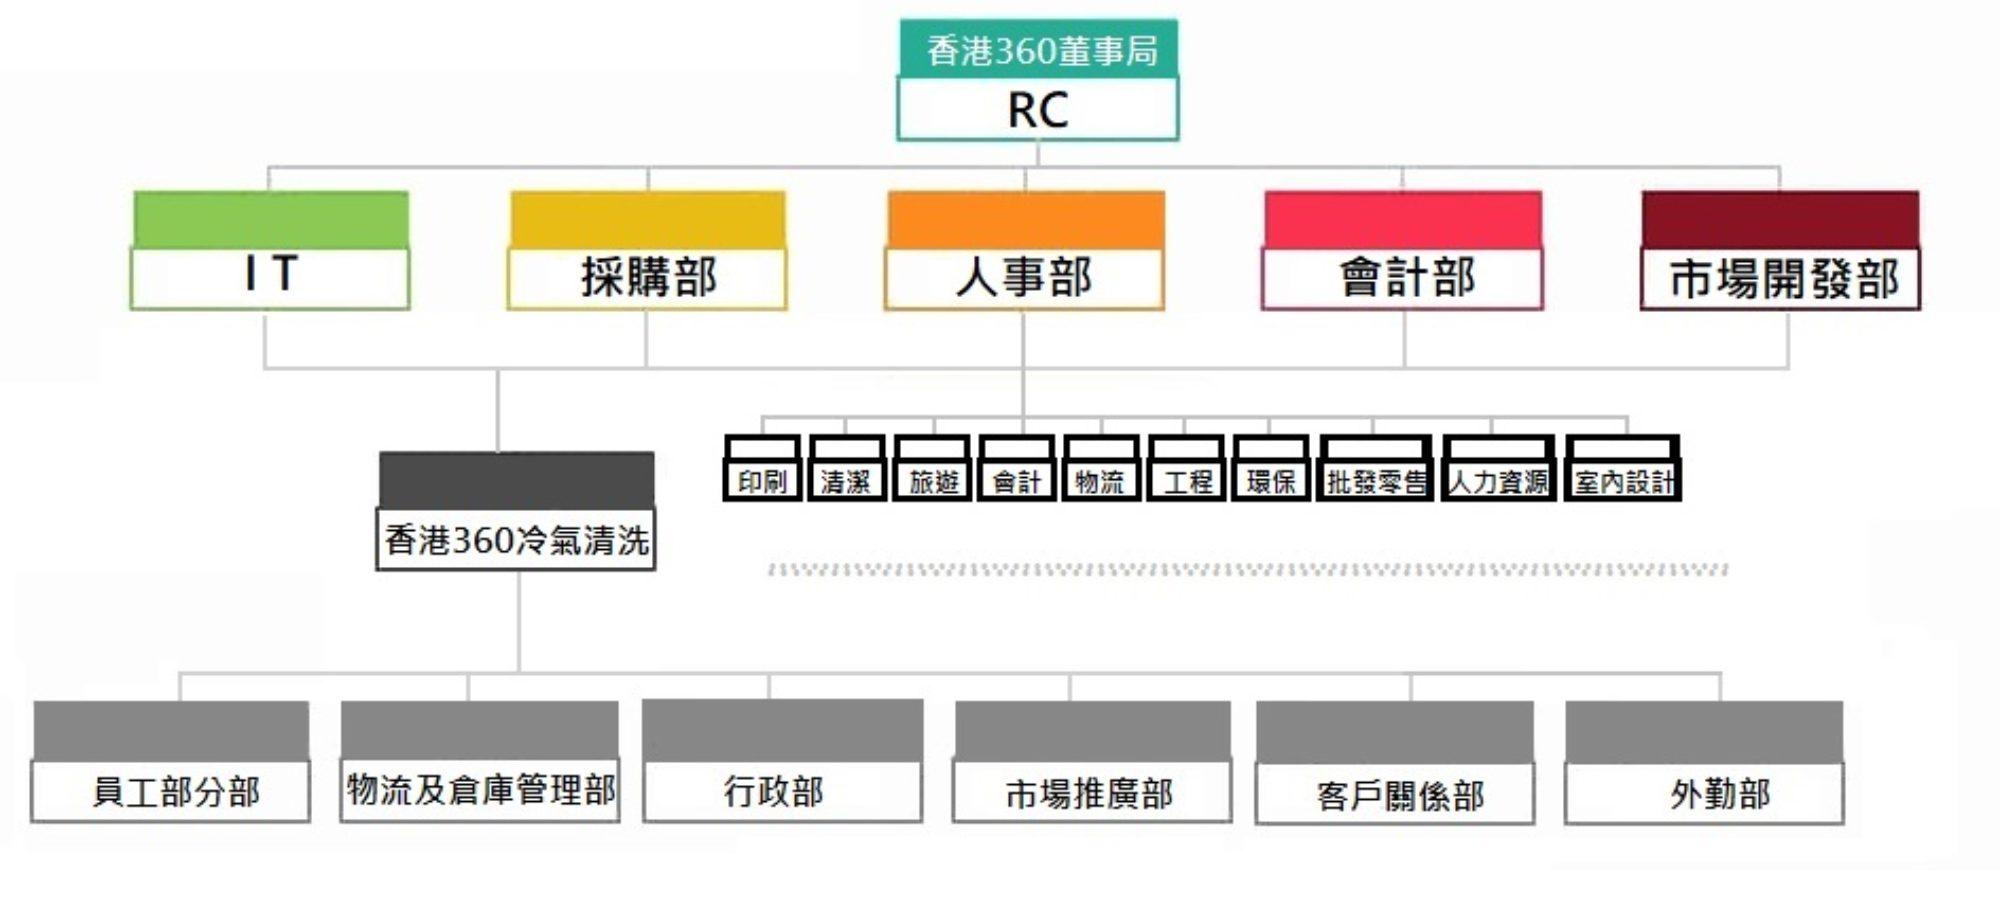 https://www.360acclean.com.hk/wp-content/uploads/2019/07/360ACCLEAN_org-chart-2000x900.jpg